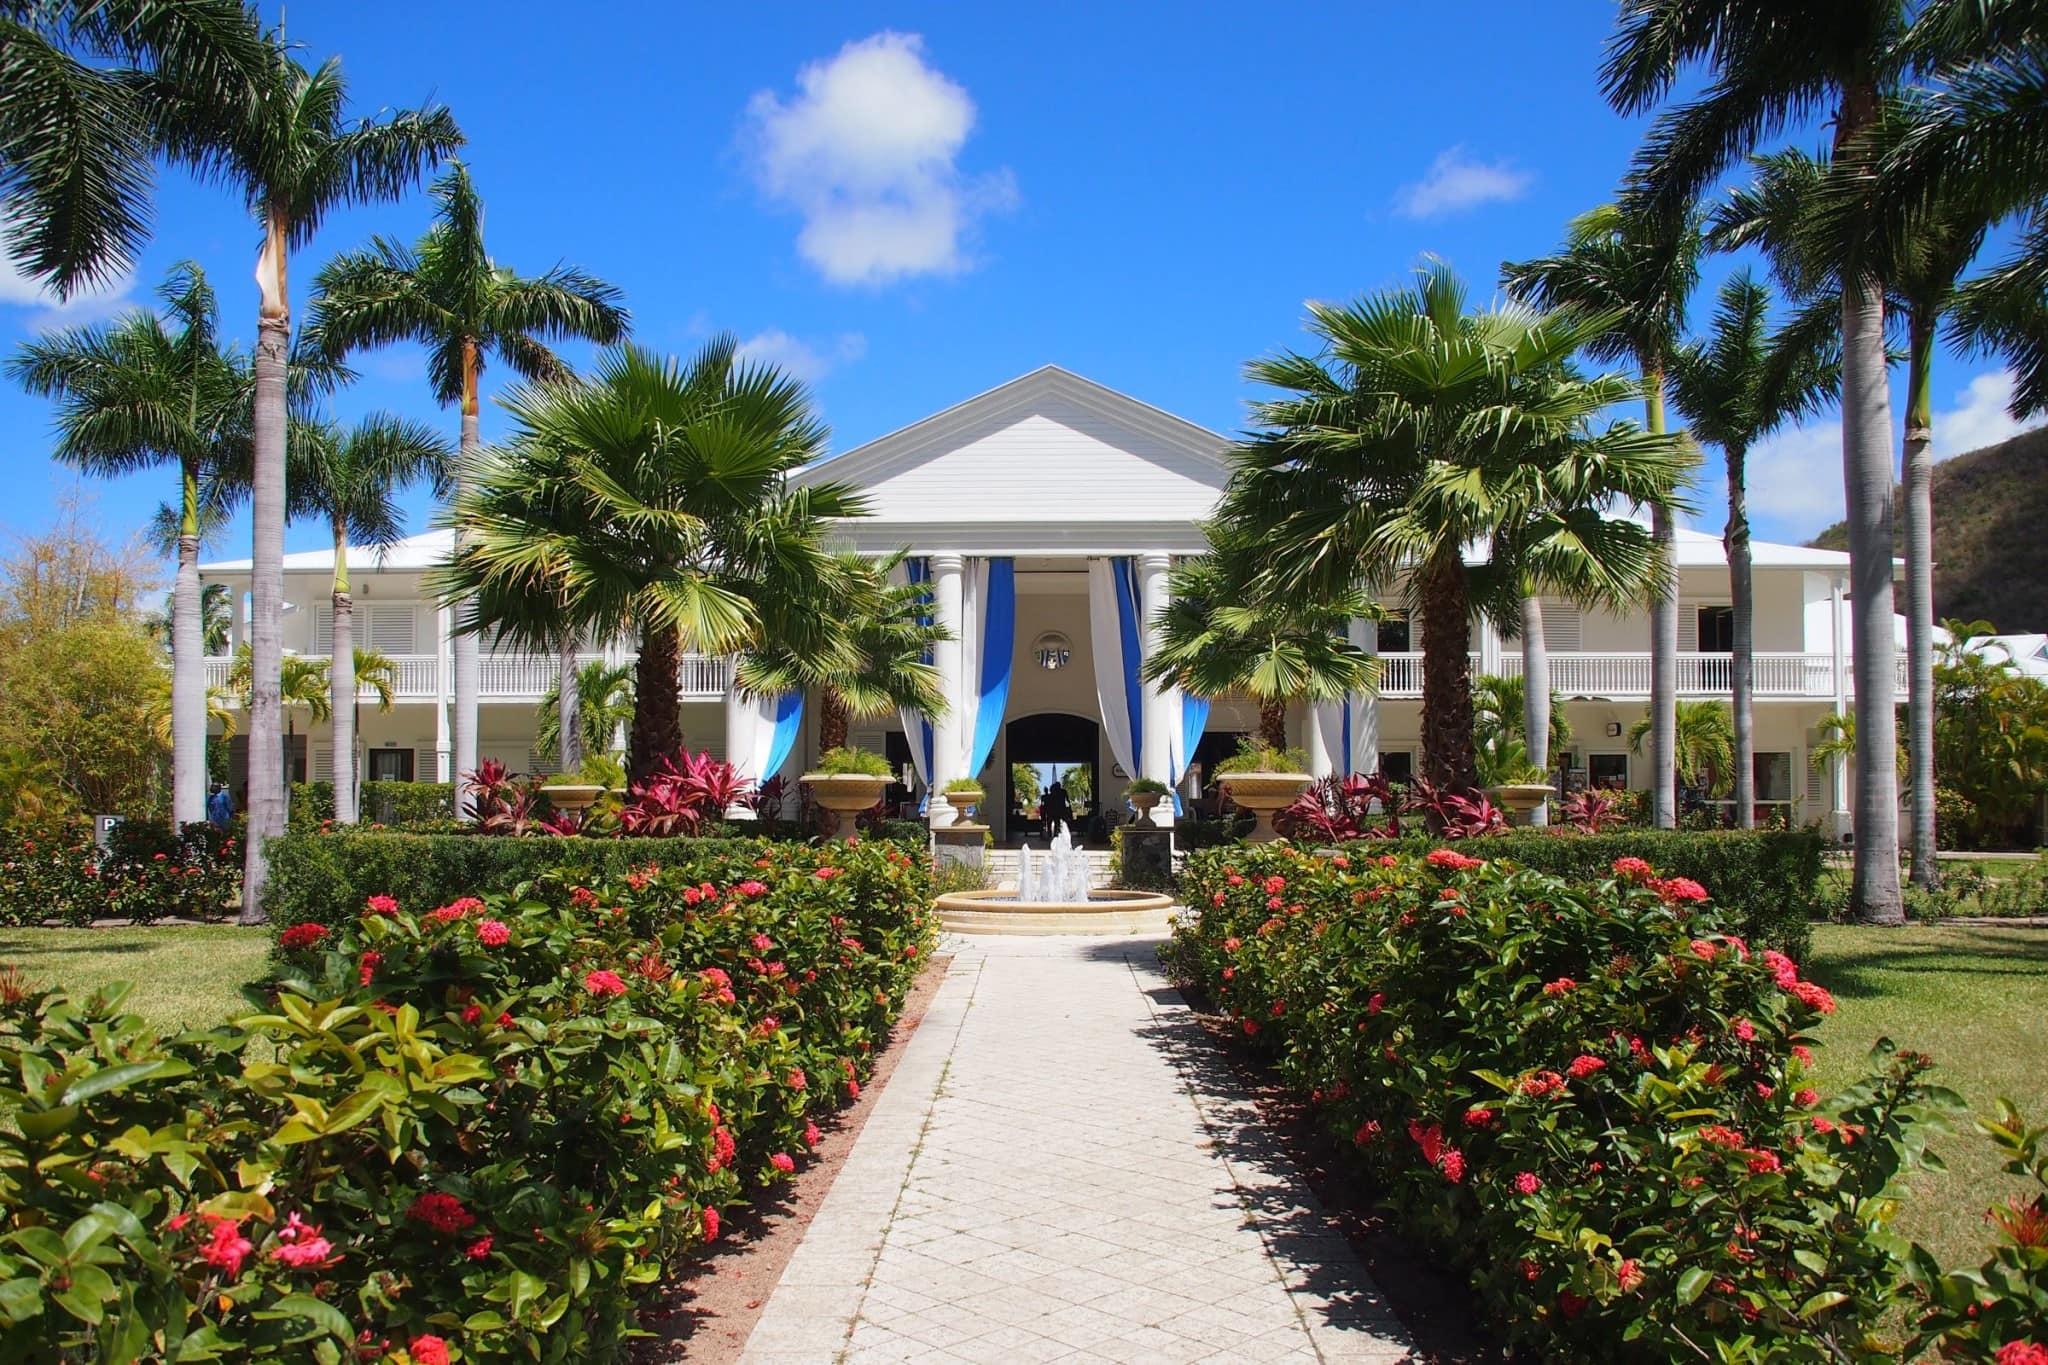 RIU Palace Resort St. Martin, An Uncommon All-Inclusive